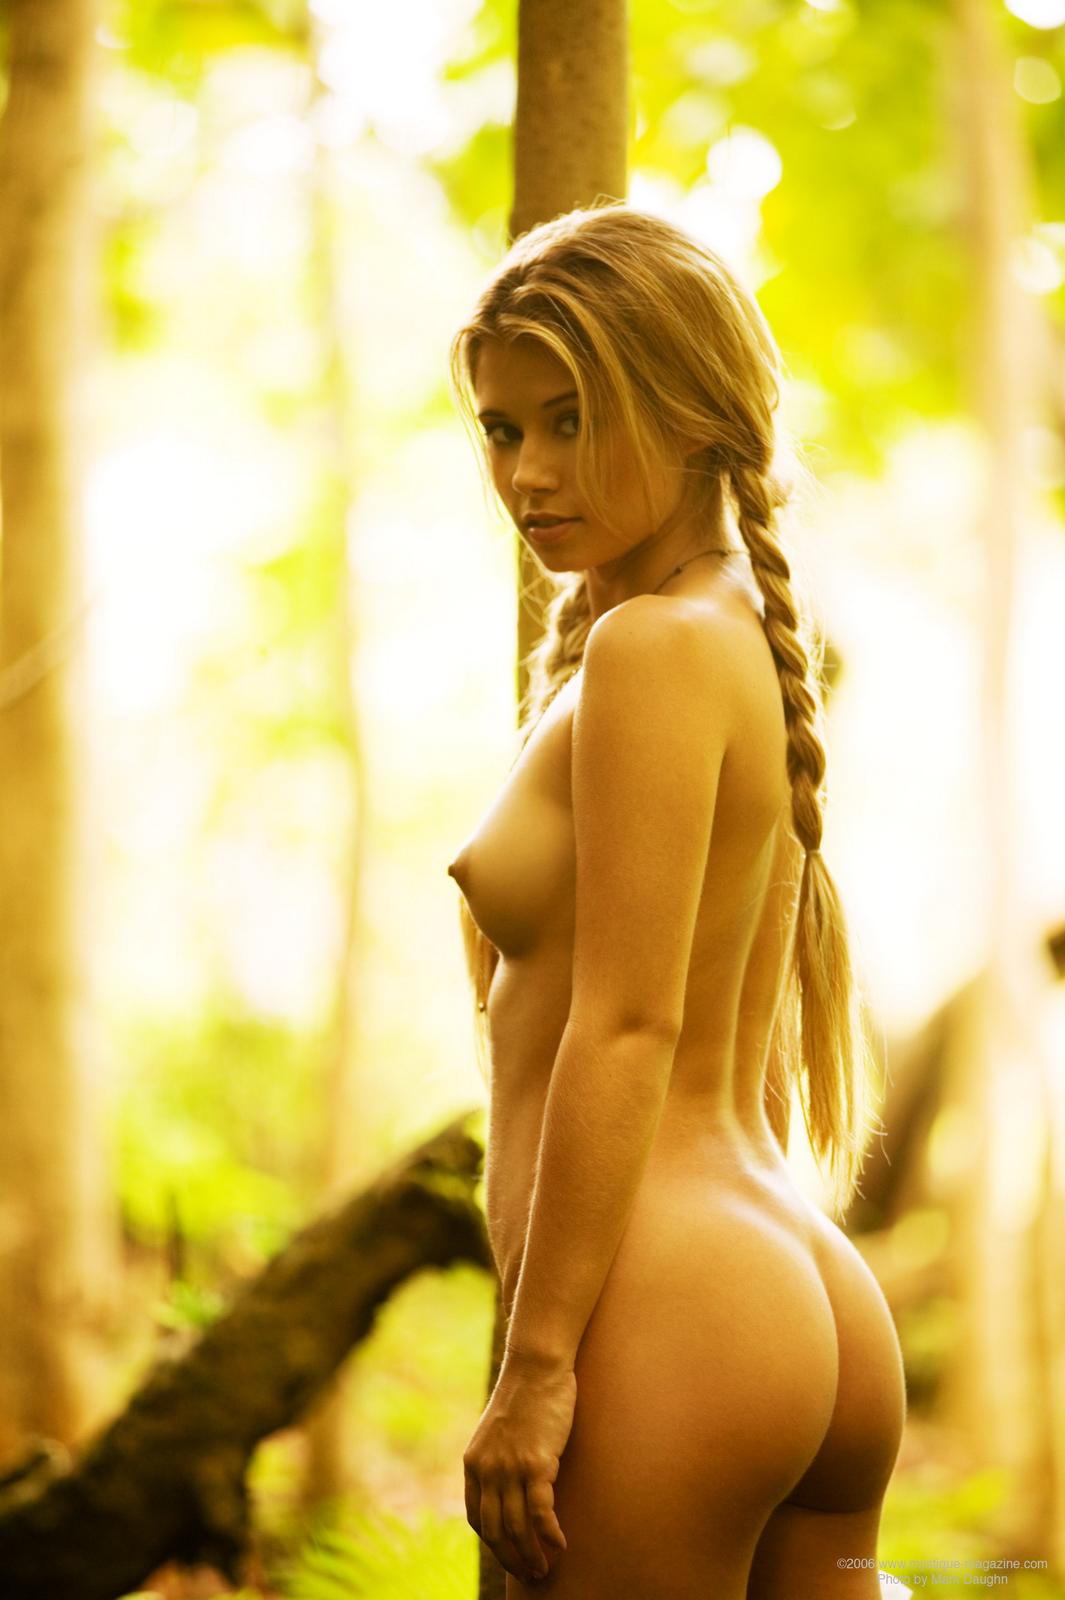 jannah-burnham-woods-blonde-pigtails-naked-mystique-magazine-10